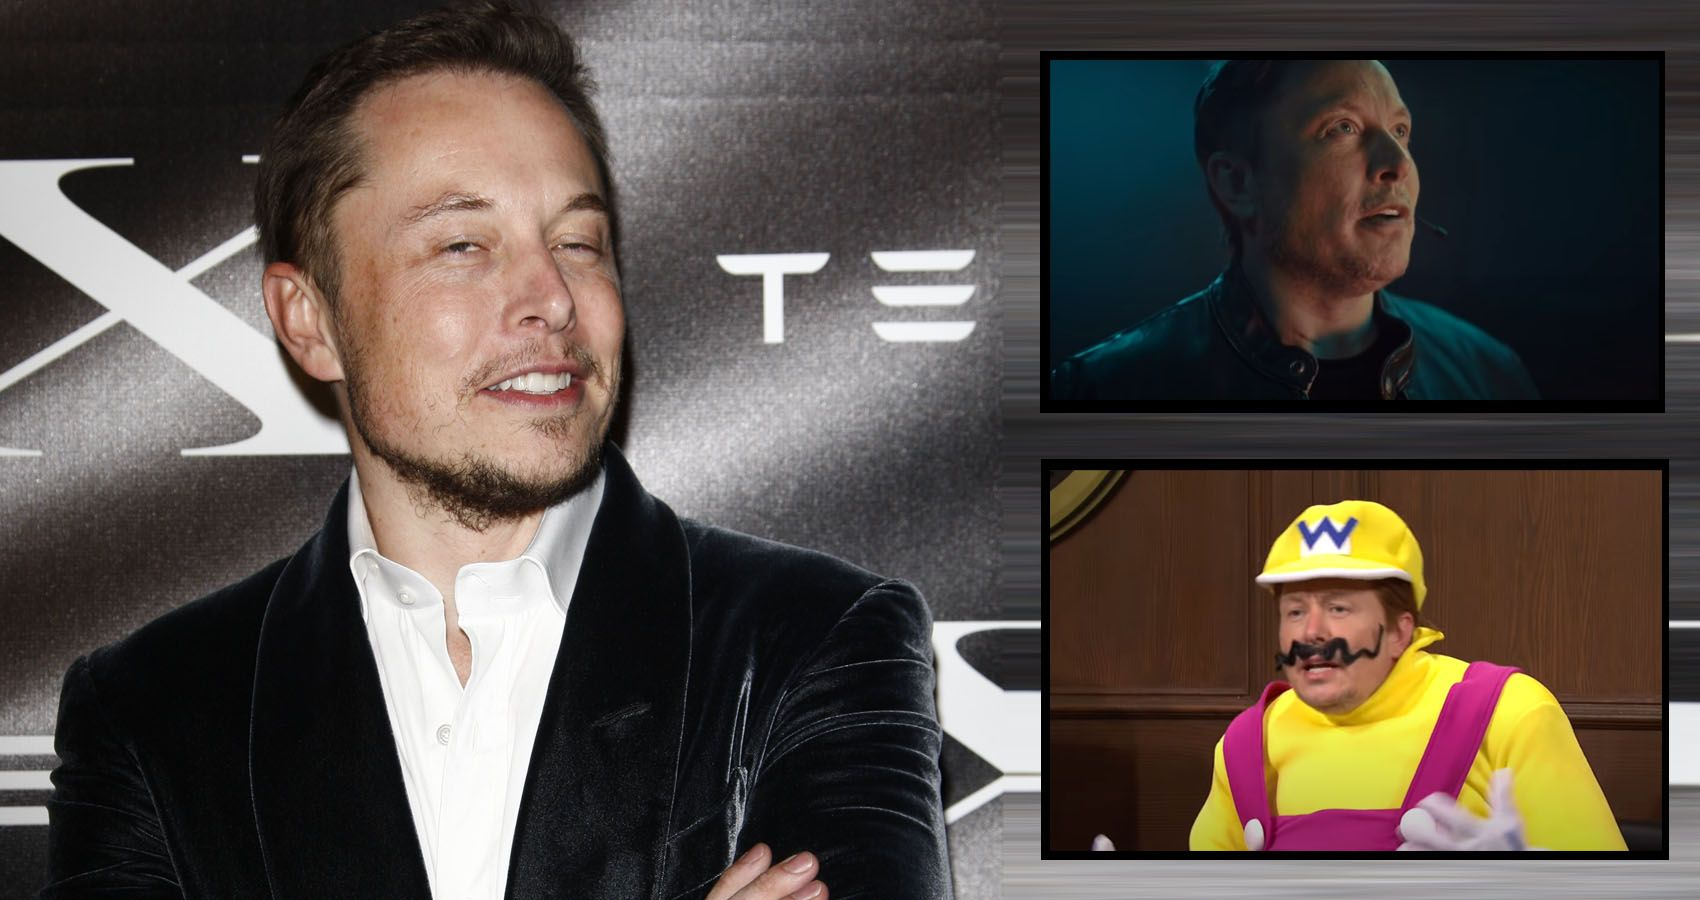 Elon Musk Sends Pete Davidson To Mars In Polarizing SNL Hosting Gig